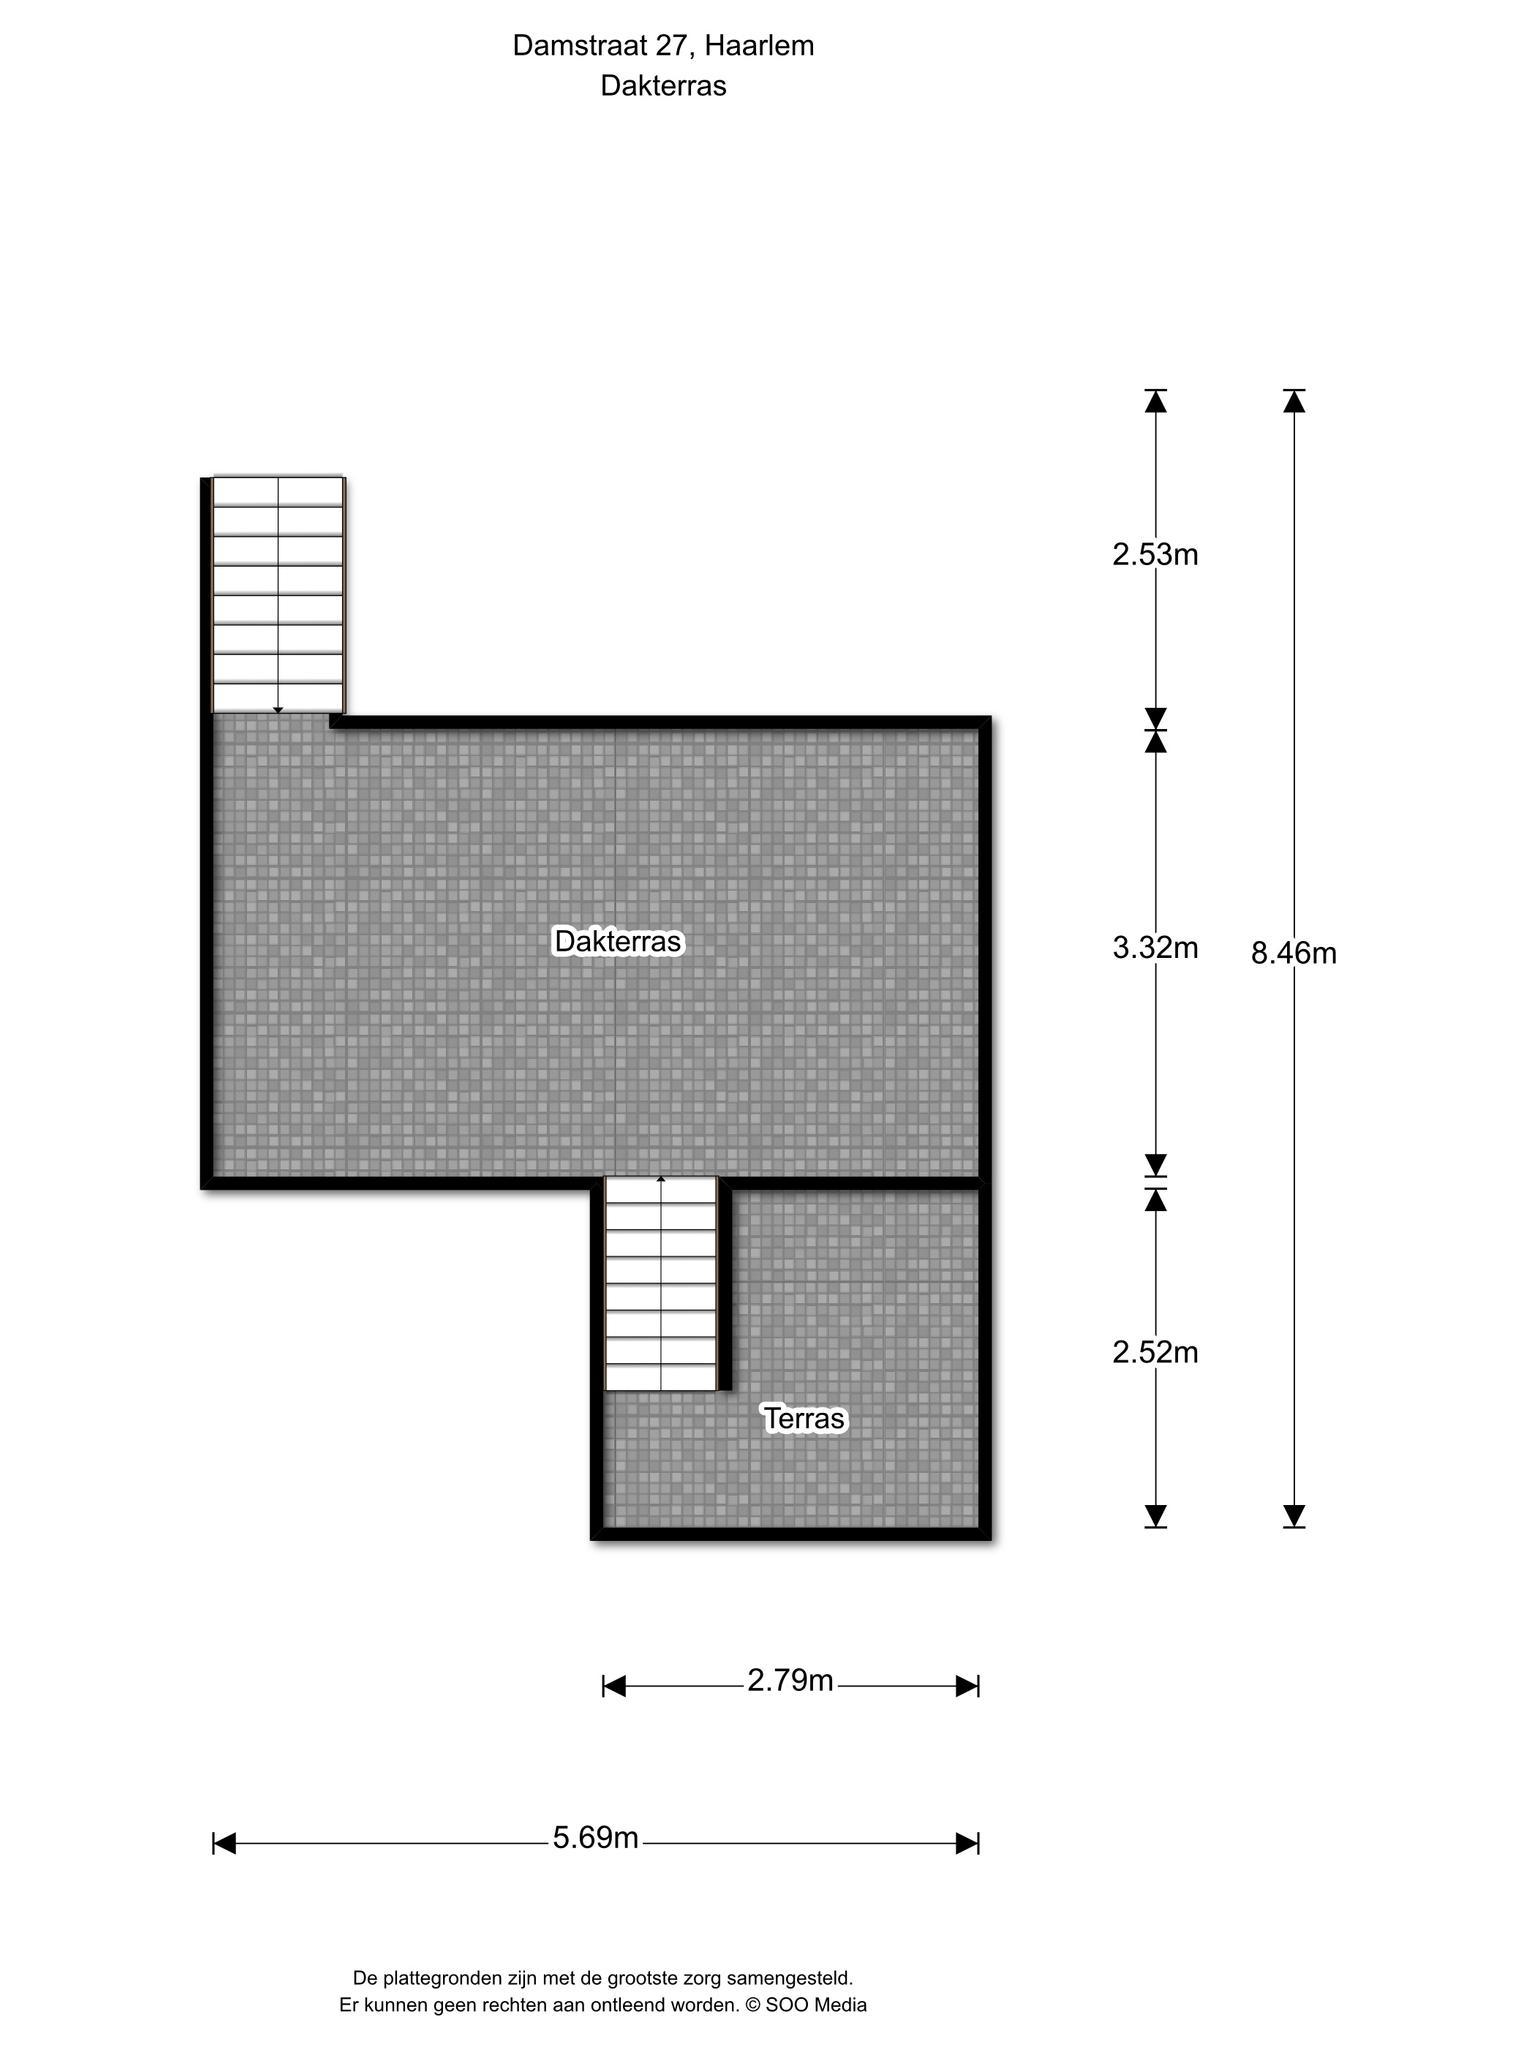 Haarlem – Damstraat 27 – Plattegrond 3